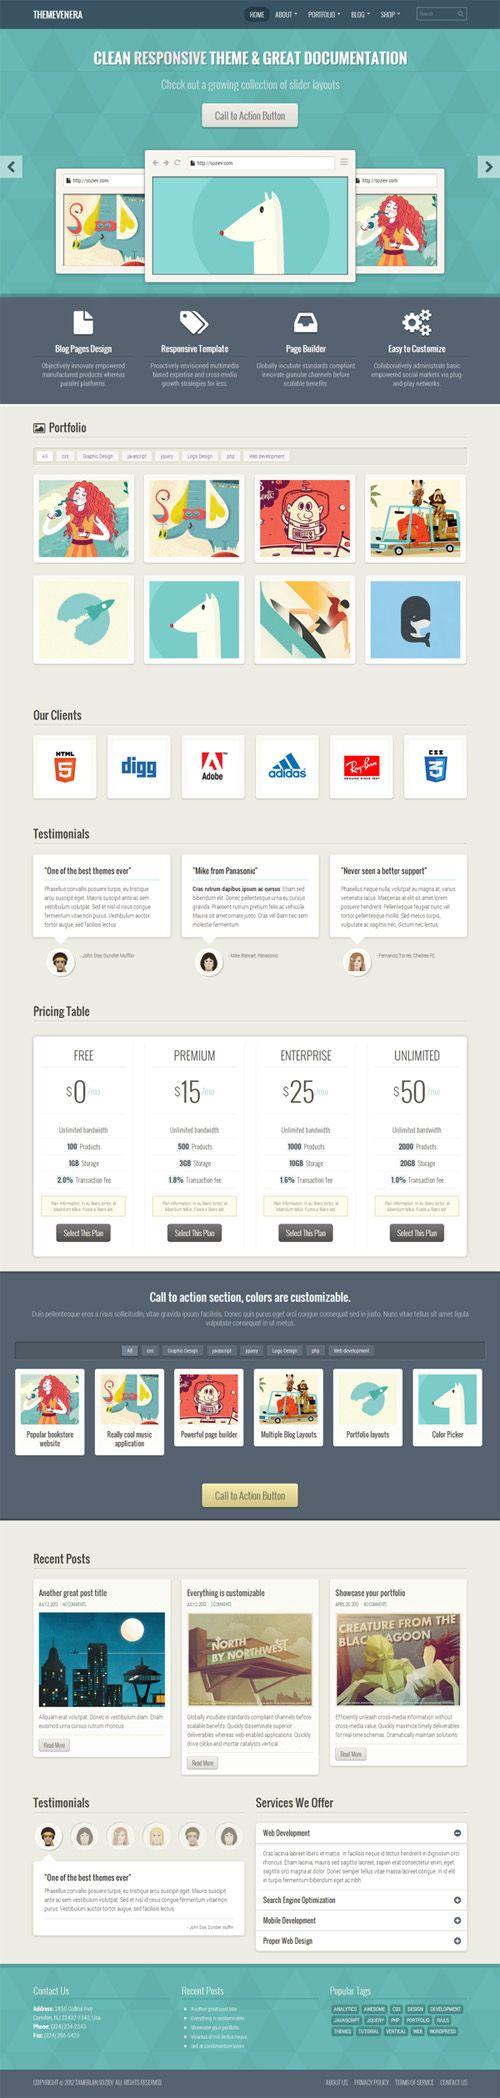 WordPress Themes: Responsive Design Premium Themes | Wordpress Themes | Graphic Design Junction